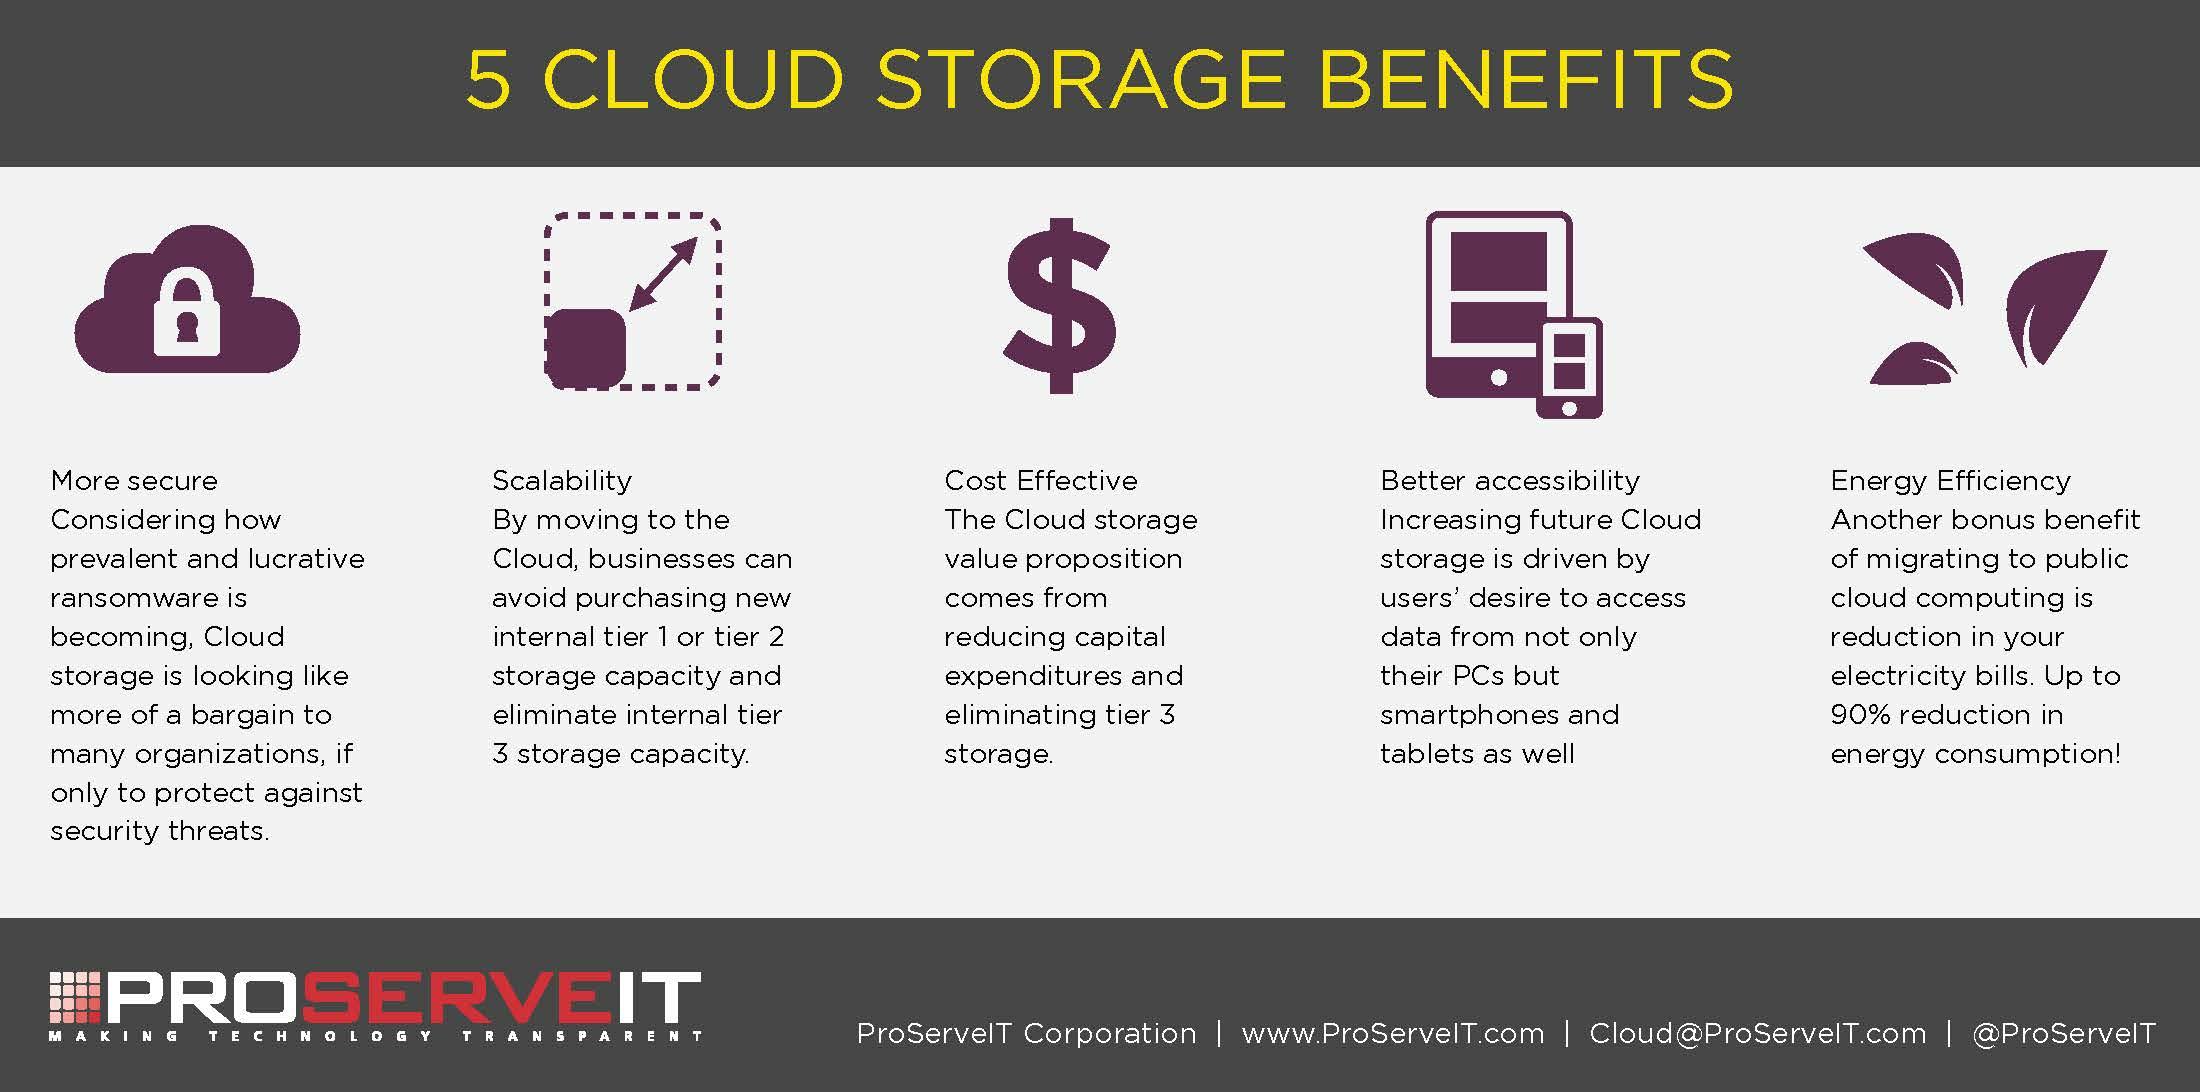 5 cloud storage benefits